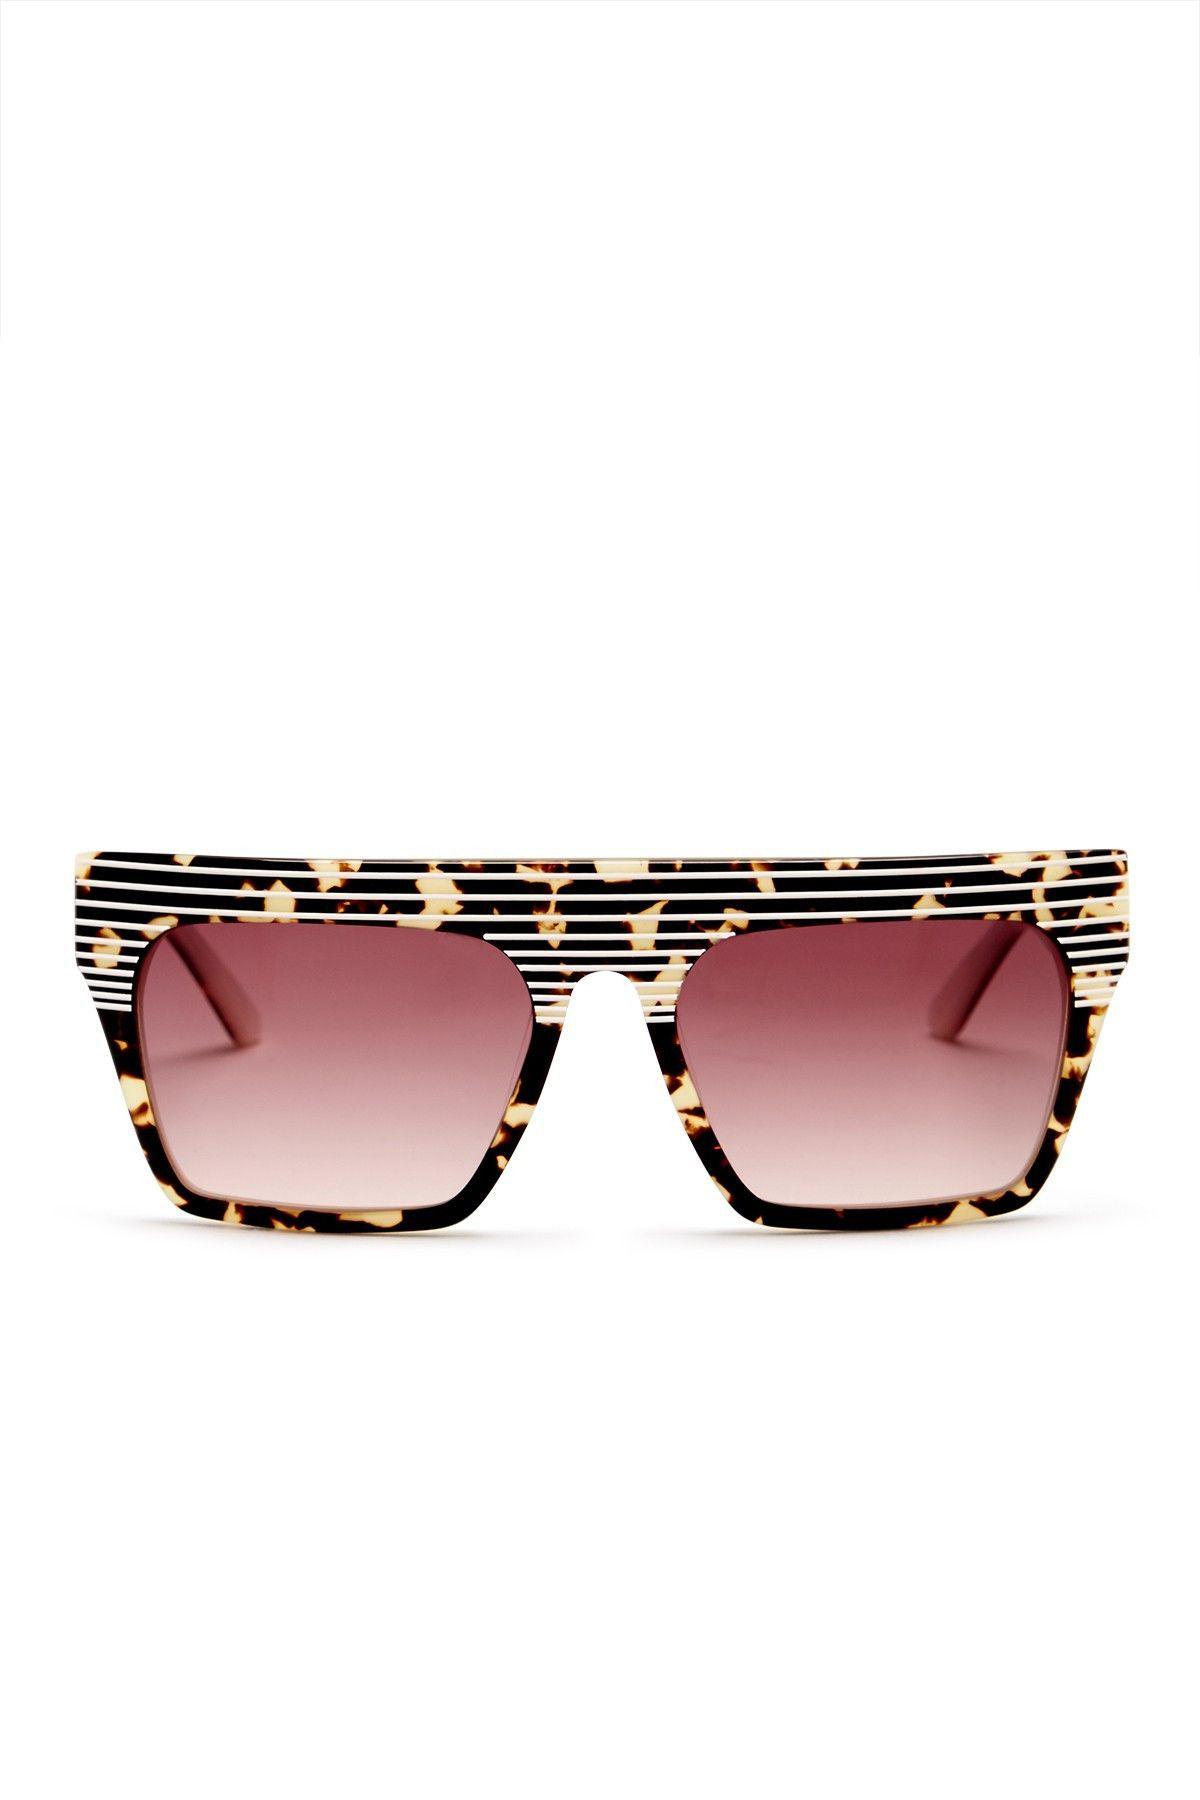 Women s Full Rim Square Shape Sunglasses Products